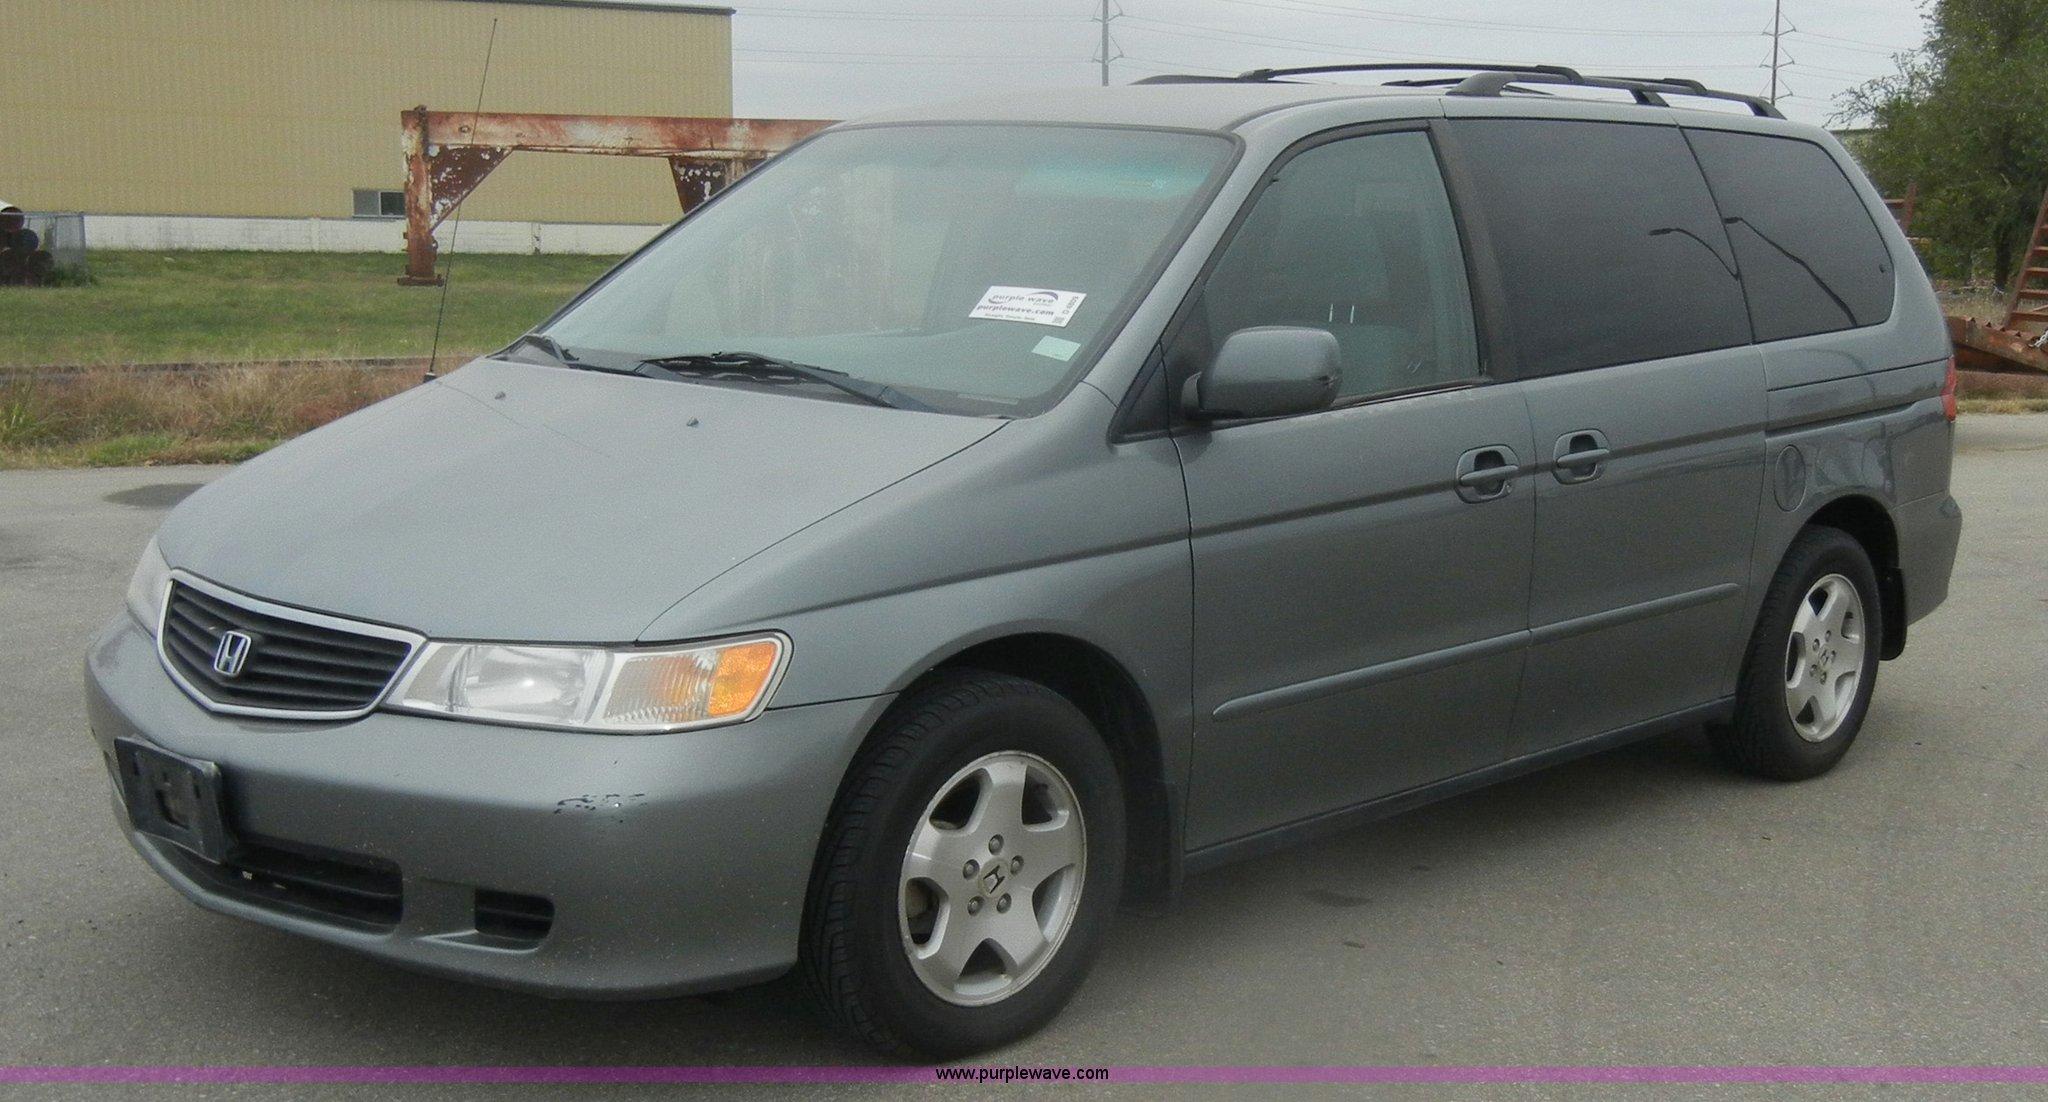 2000 honda odyssey ex mini van in manhattan ks item d4809 sold purple wave 2000 honda odyssey ex mini van in